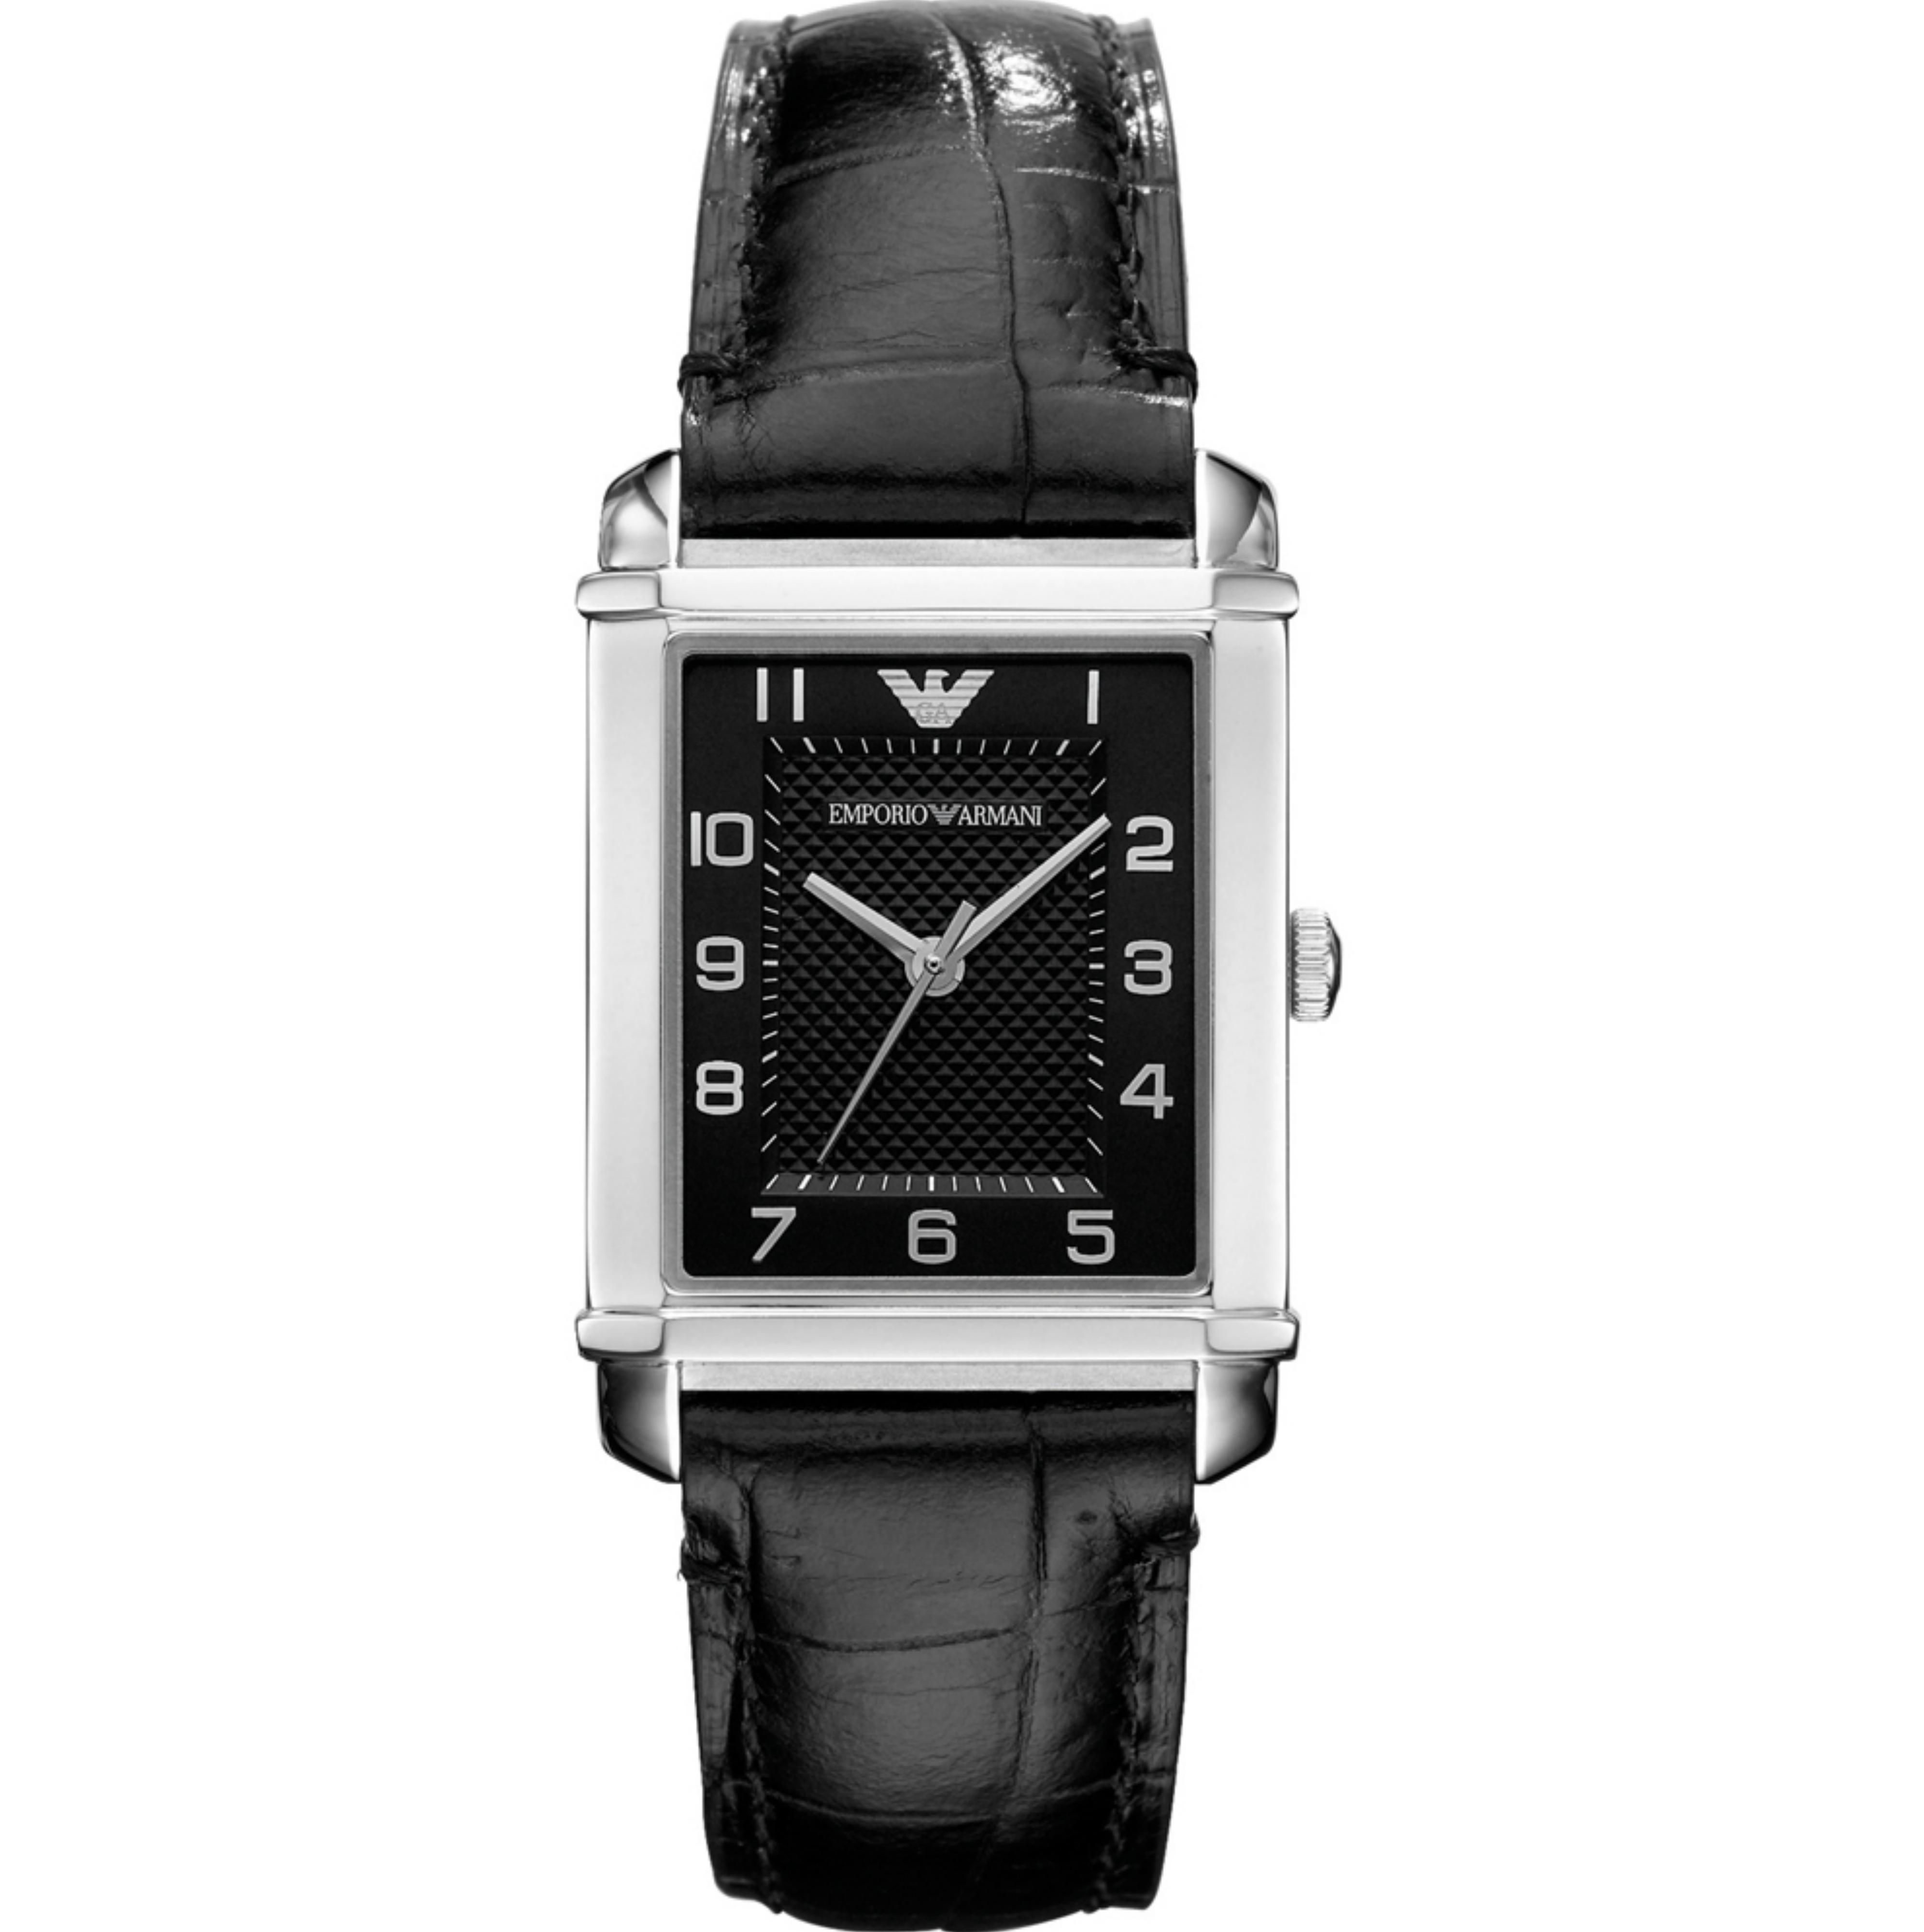 Emporio Armani Classic Ladies' Formal Wach|Black Dial|Leather Strap|AR0364